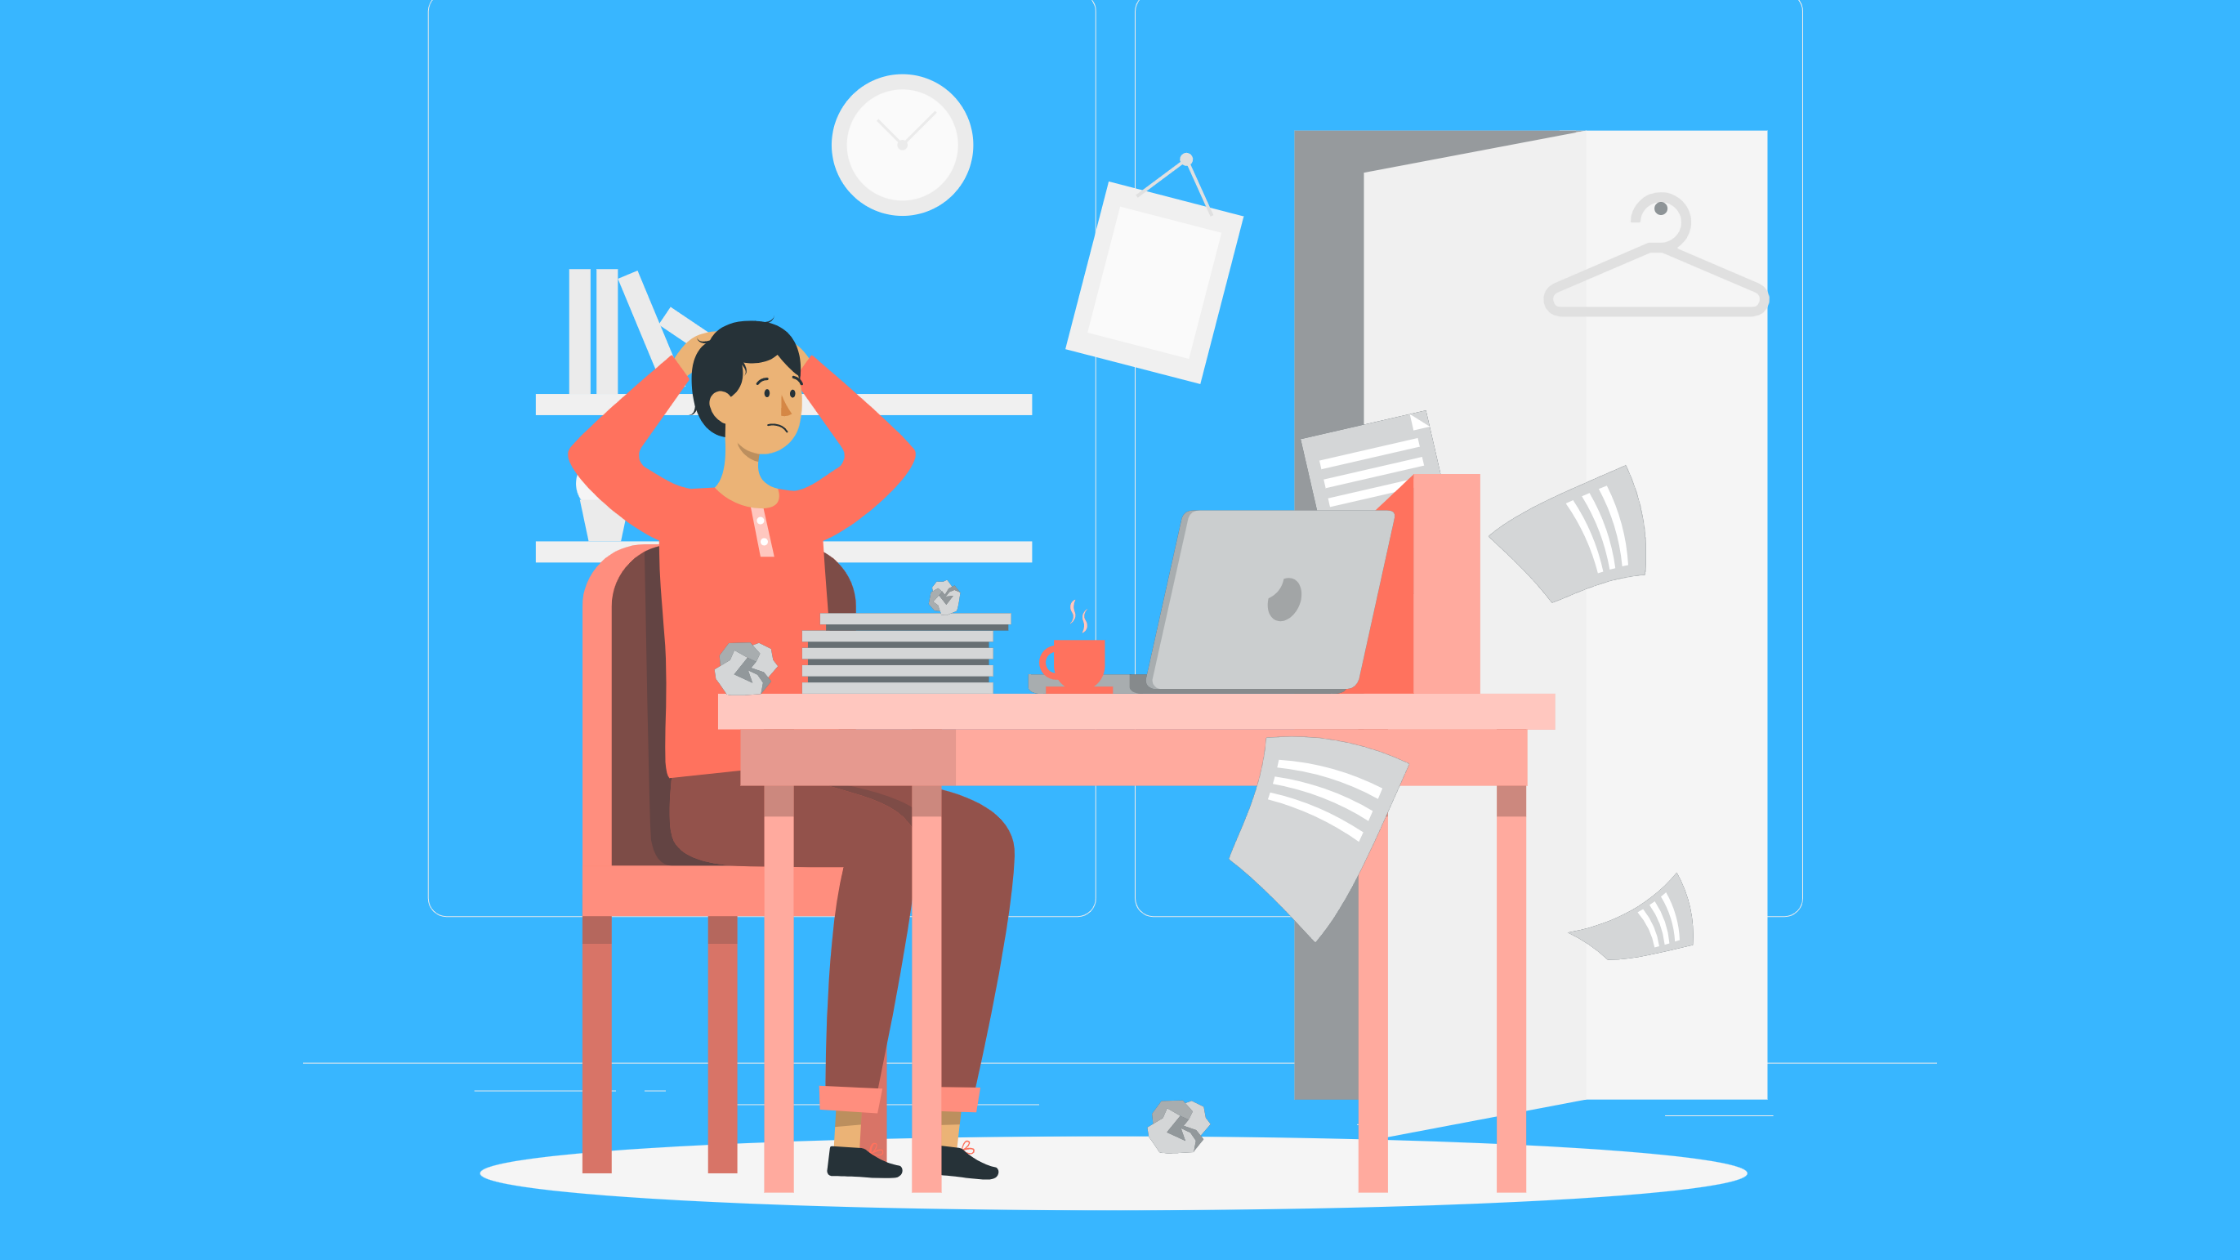 Clutter Flat Illustrations